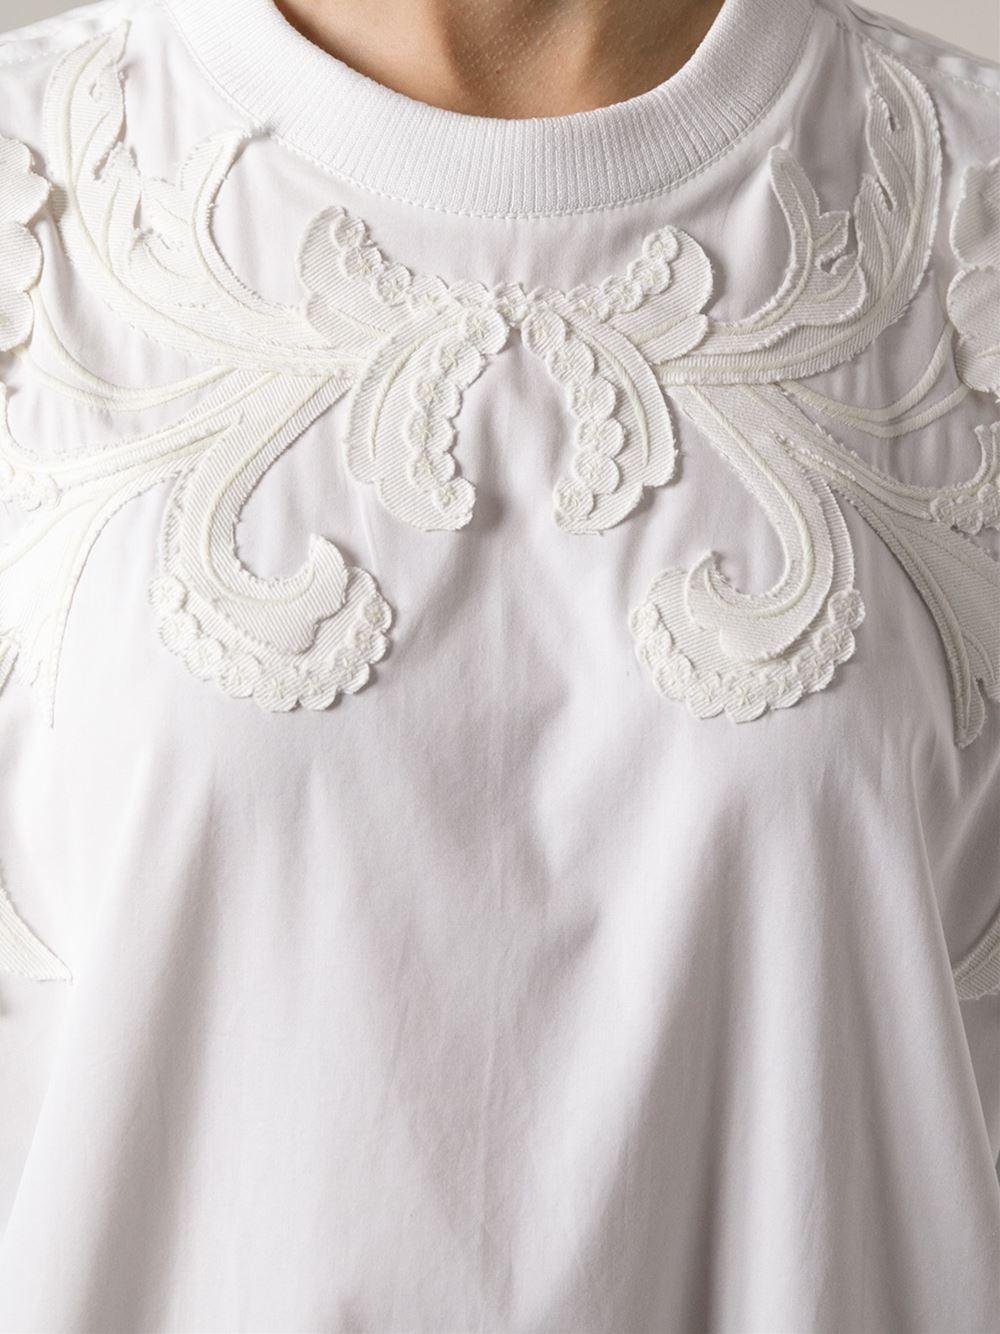 Givenchy Floral Appliqued Sweatshirt - Jofré - Farfetch.com